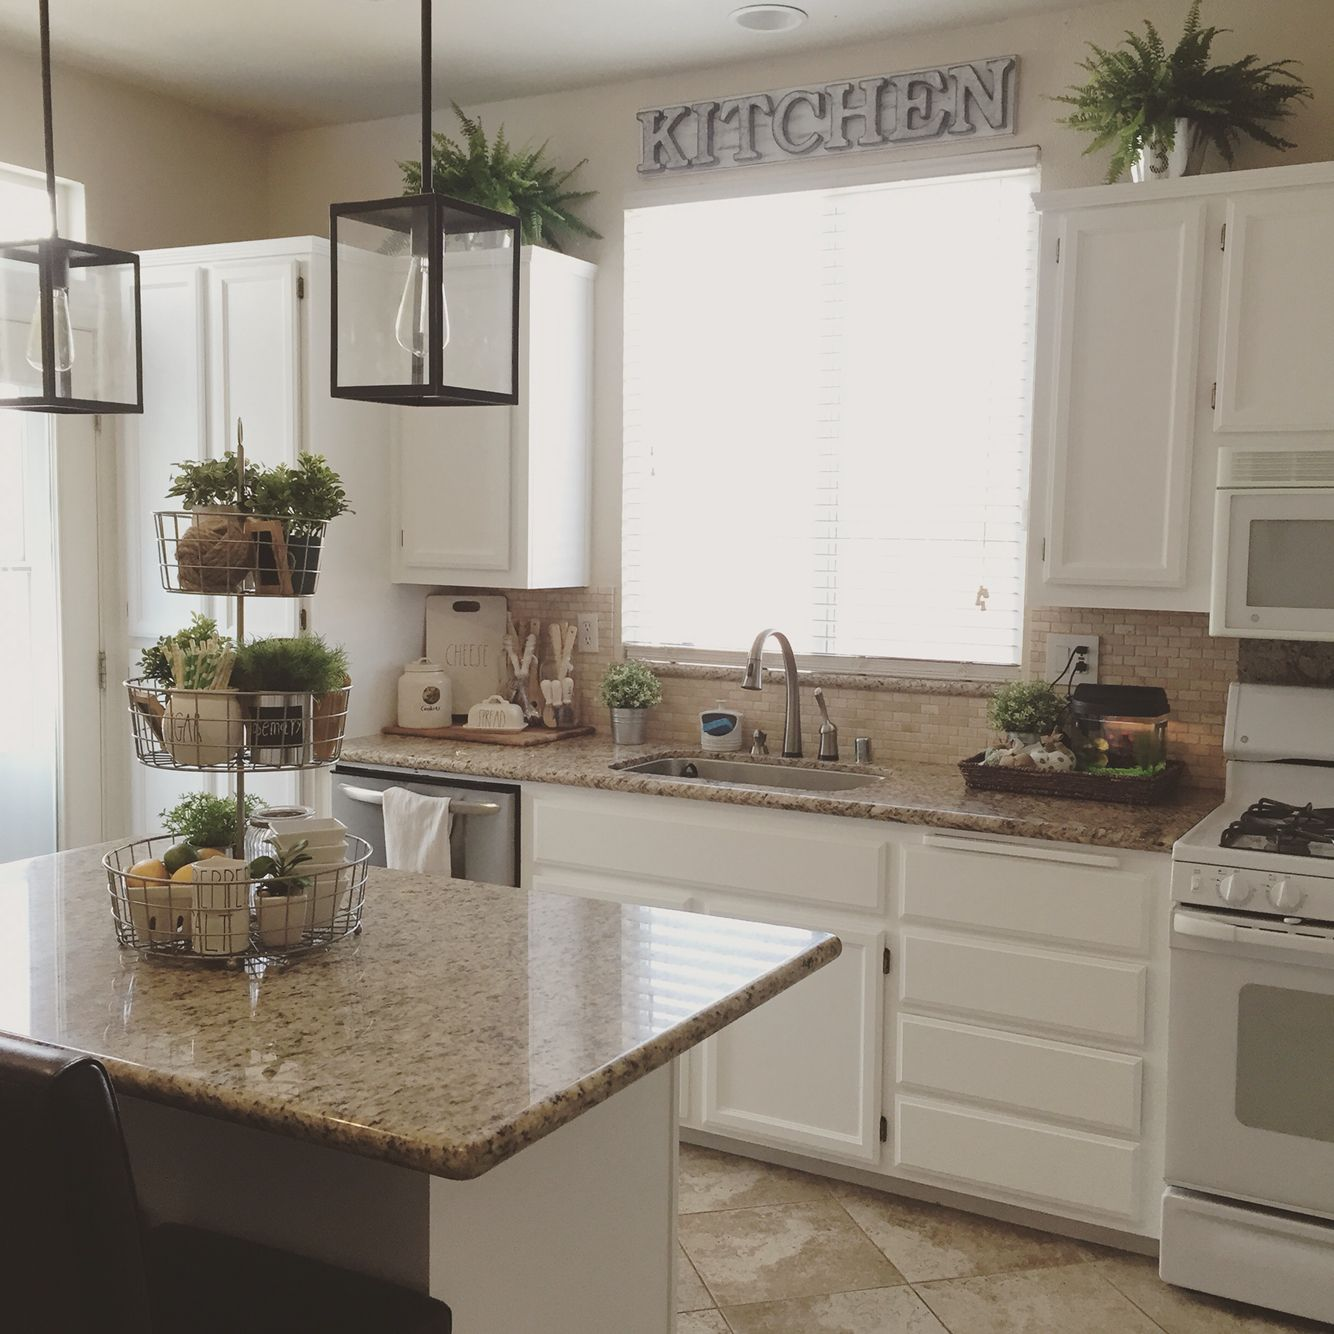 Farmhouse kitchen.   Decorating above kitchen cabinets ...